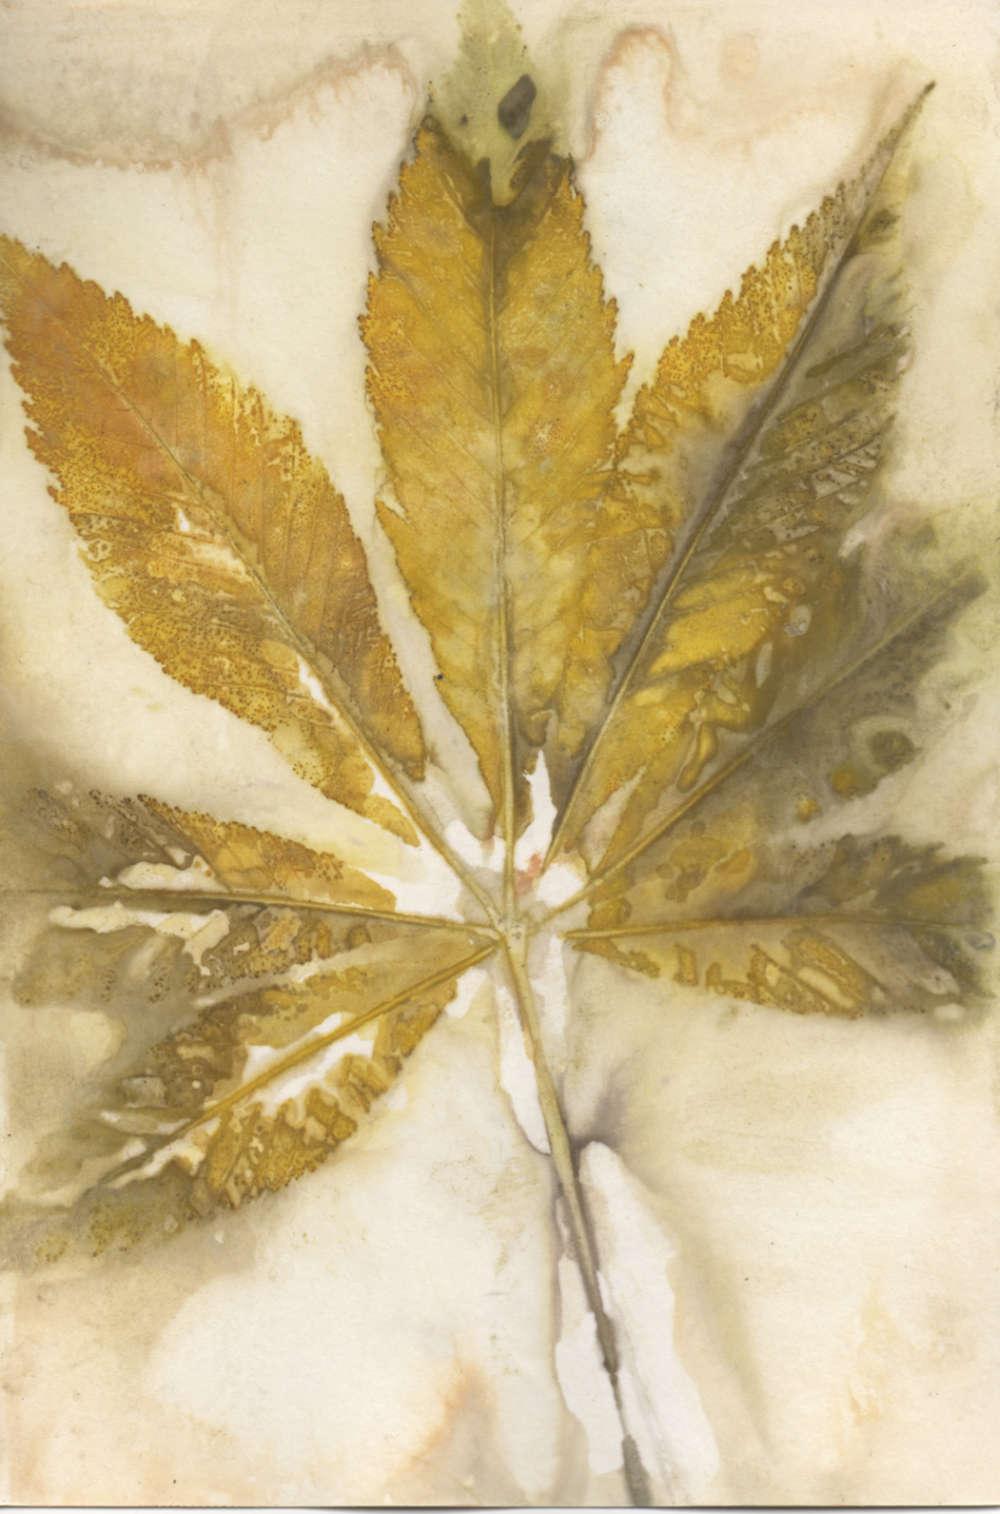 Eco-printed paper using buckeye leaf. No enhancements.